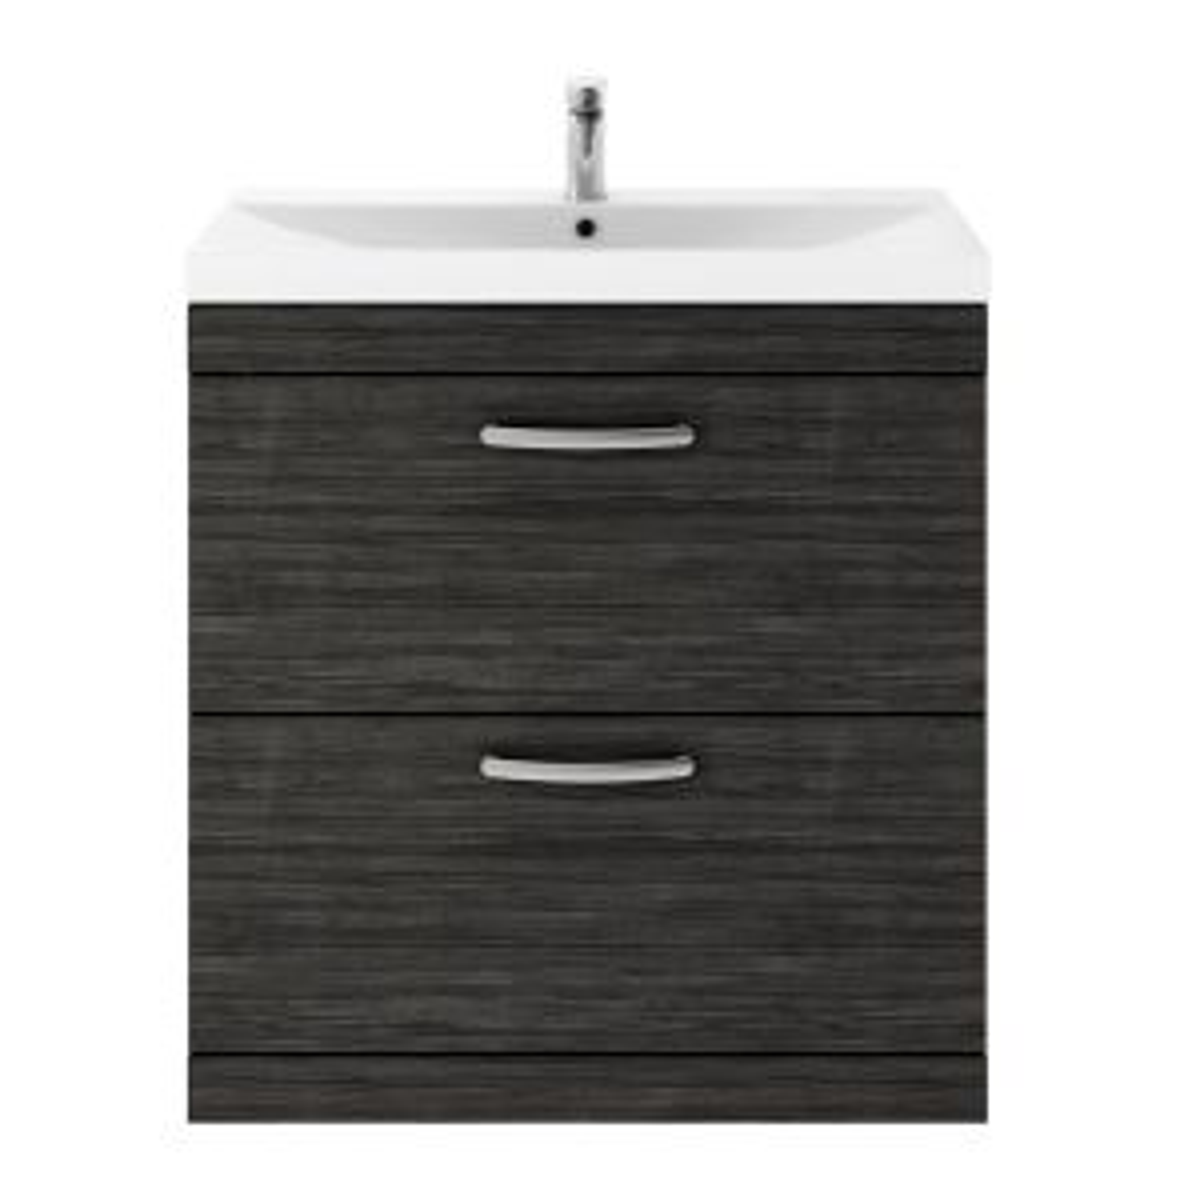 Nuie Athena Hacienda Black 2 Drawer Floor Standing Vanity Unit with 50mm Profile Basin 800mm